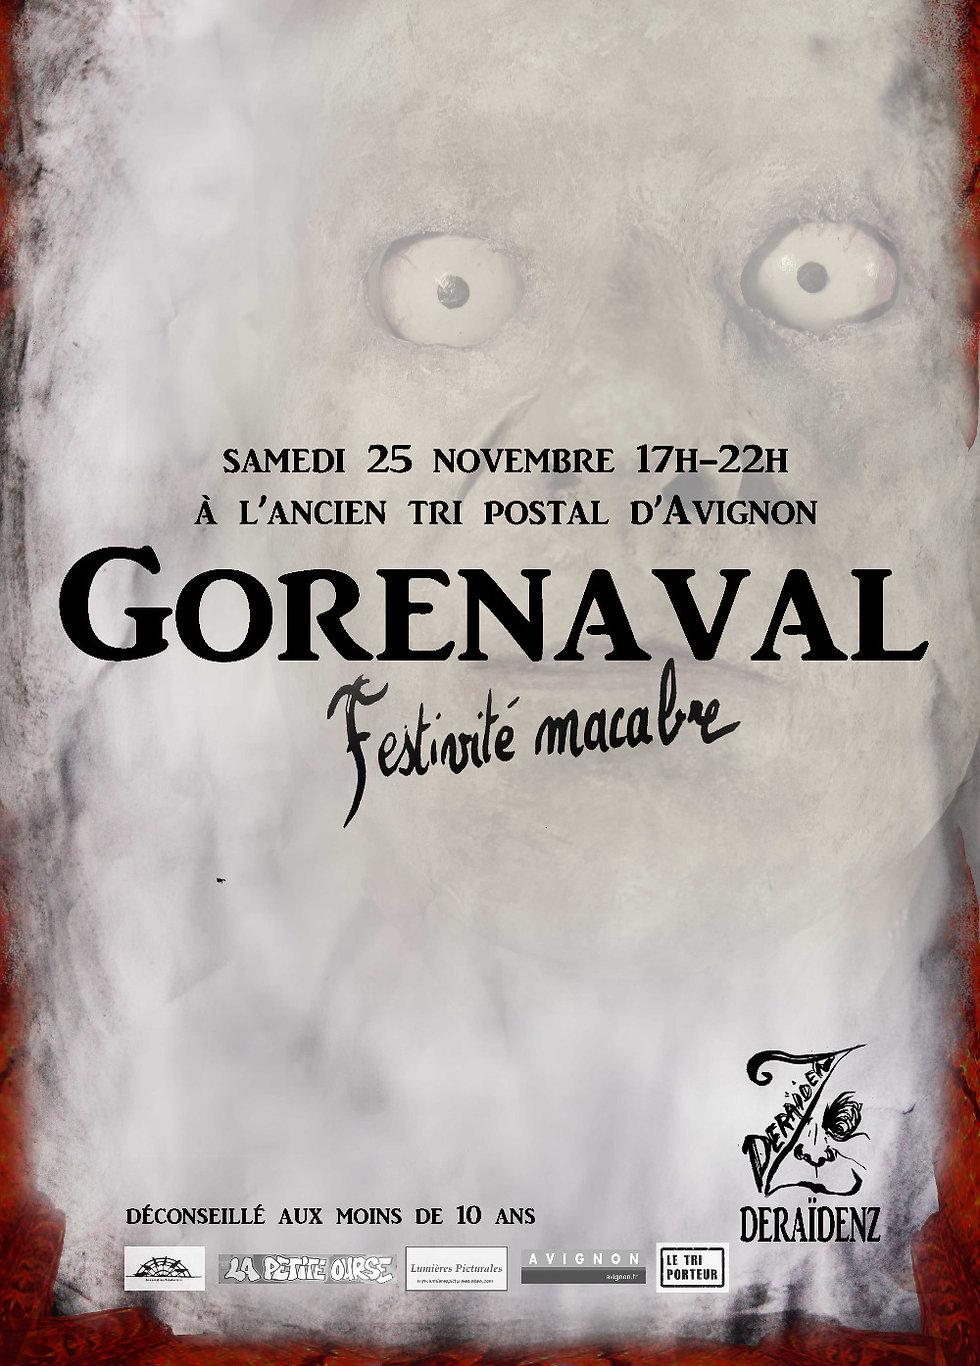 GORENAVAL_Gorenaval-avec-infos_edited.jp